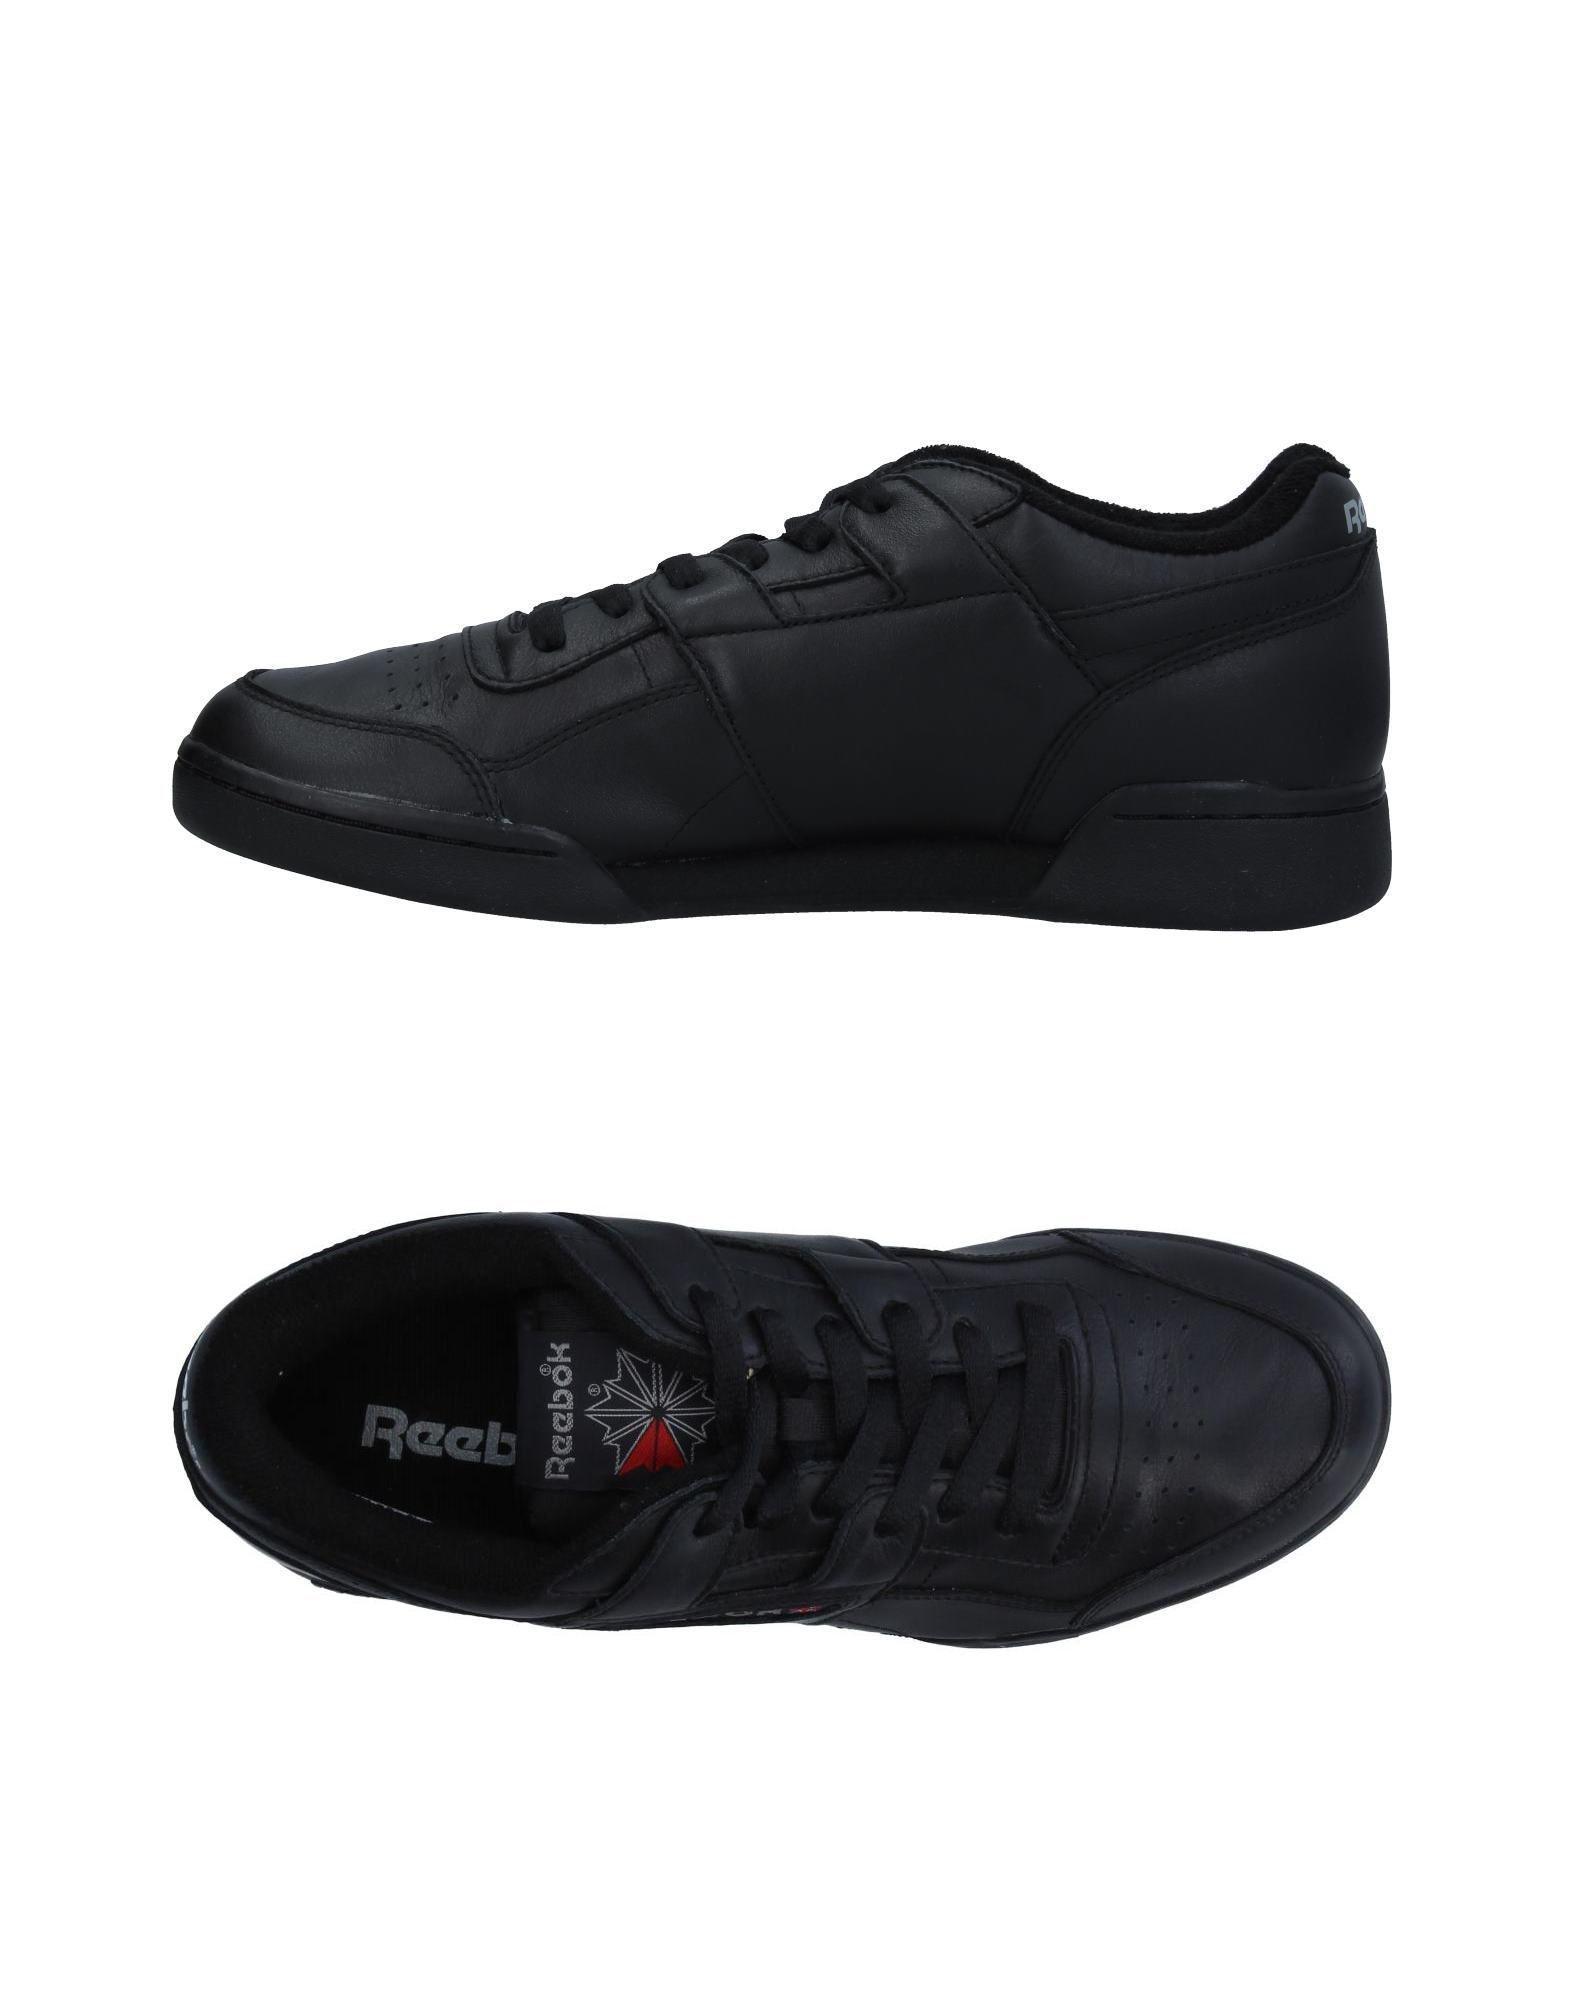 Mugnai Bas-tops Et Chaussures De Sport KQ4fCFk